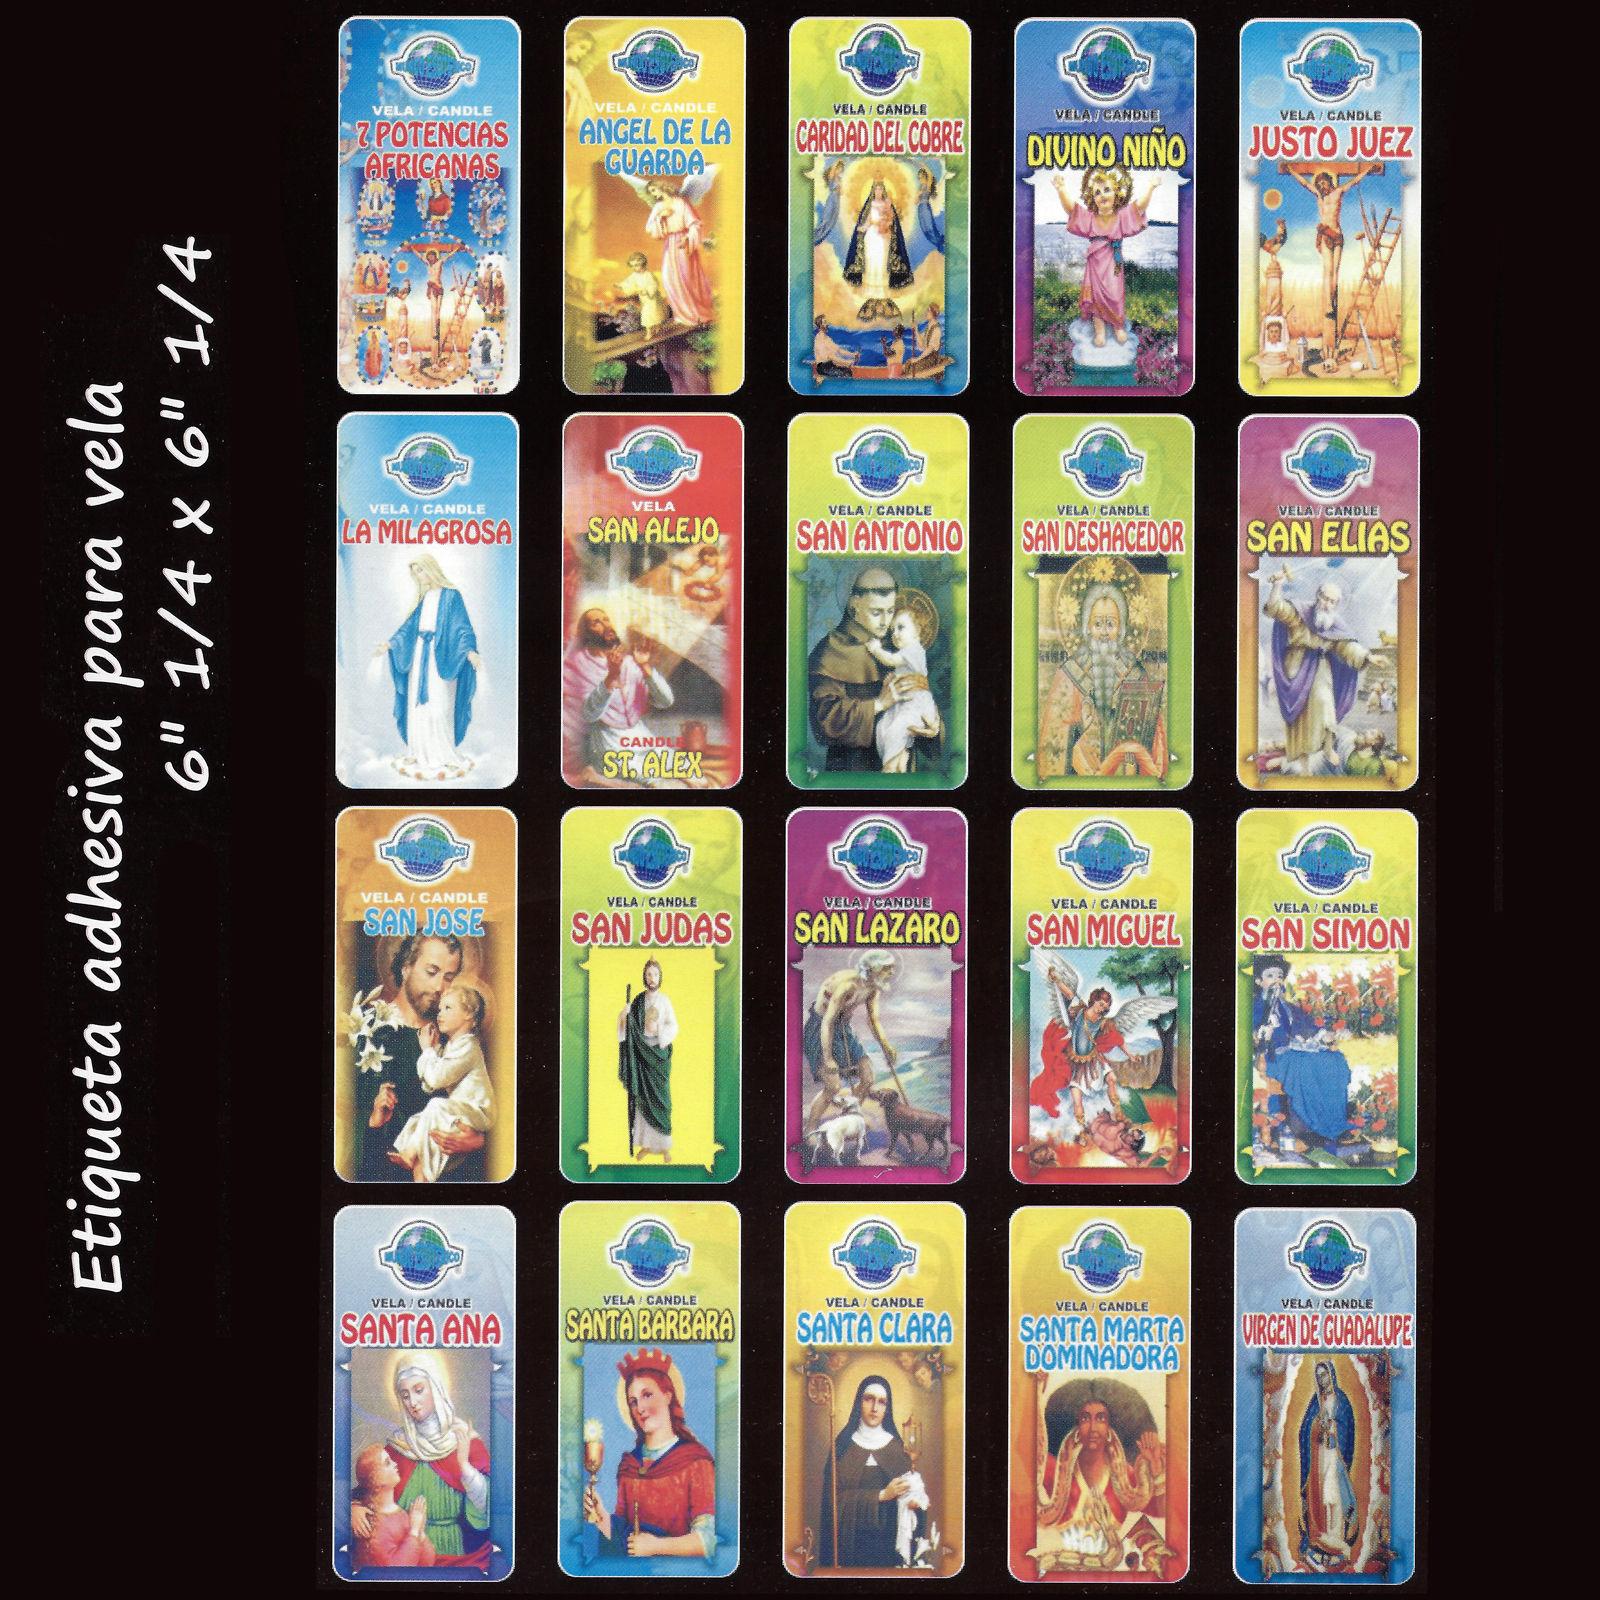 50 labels etiquetas para velas 7 dias santos angeles - Etiquetas para velas ...